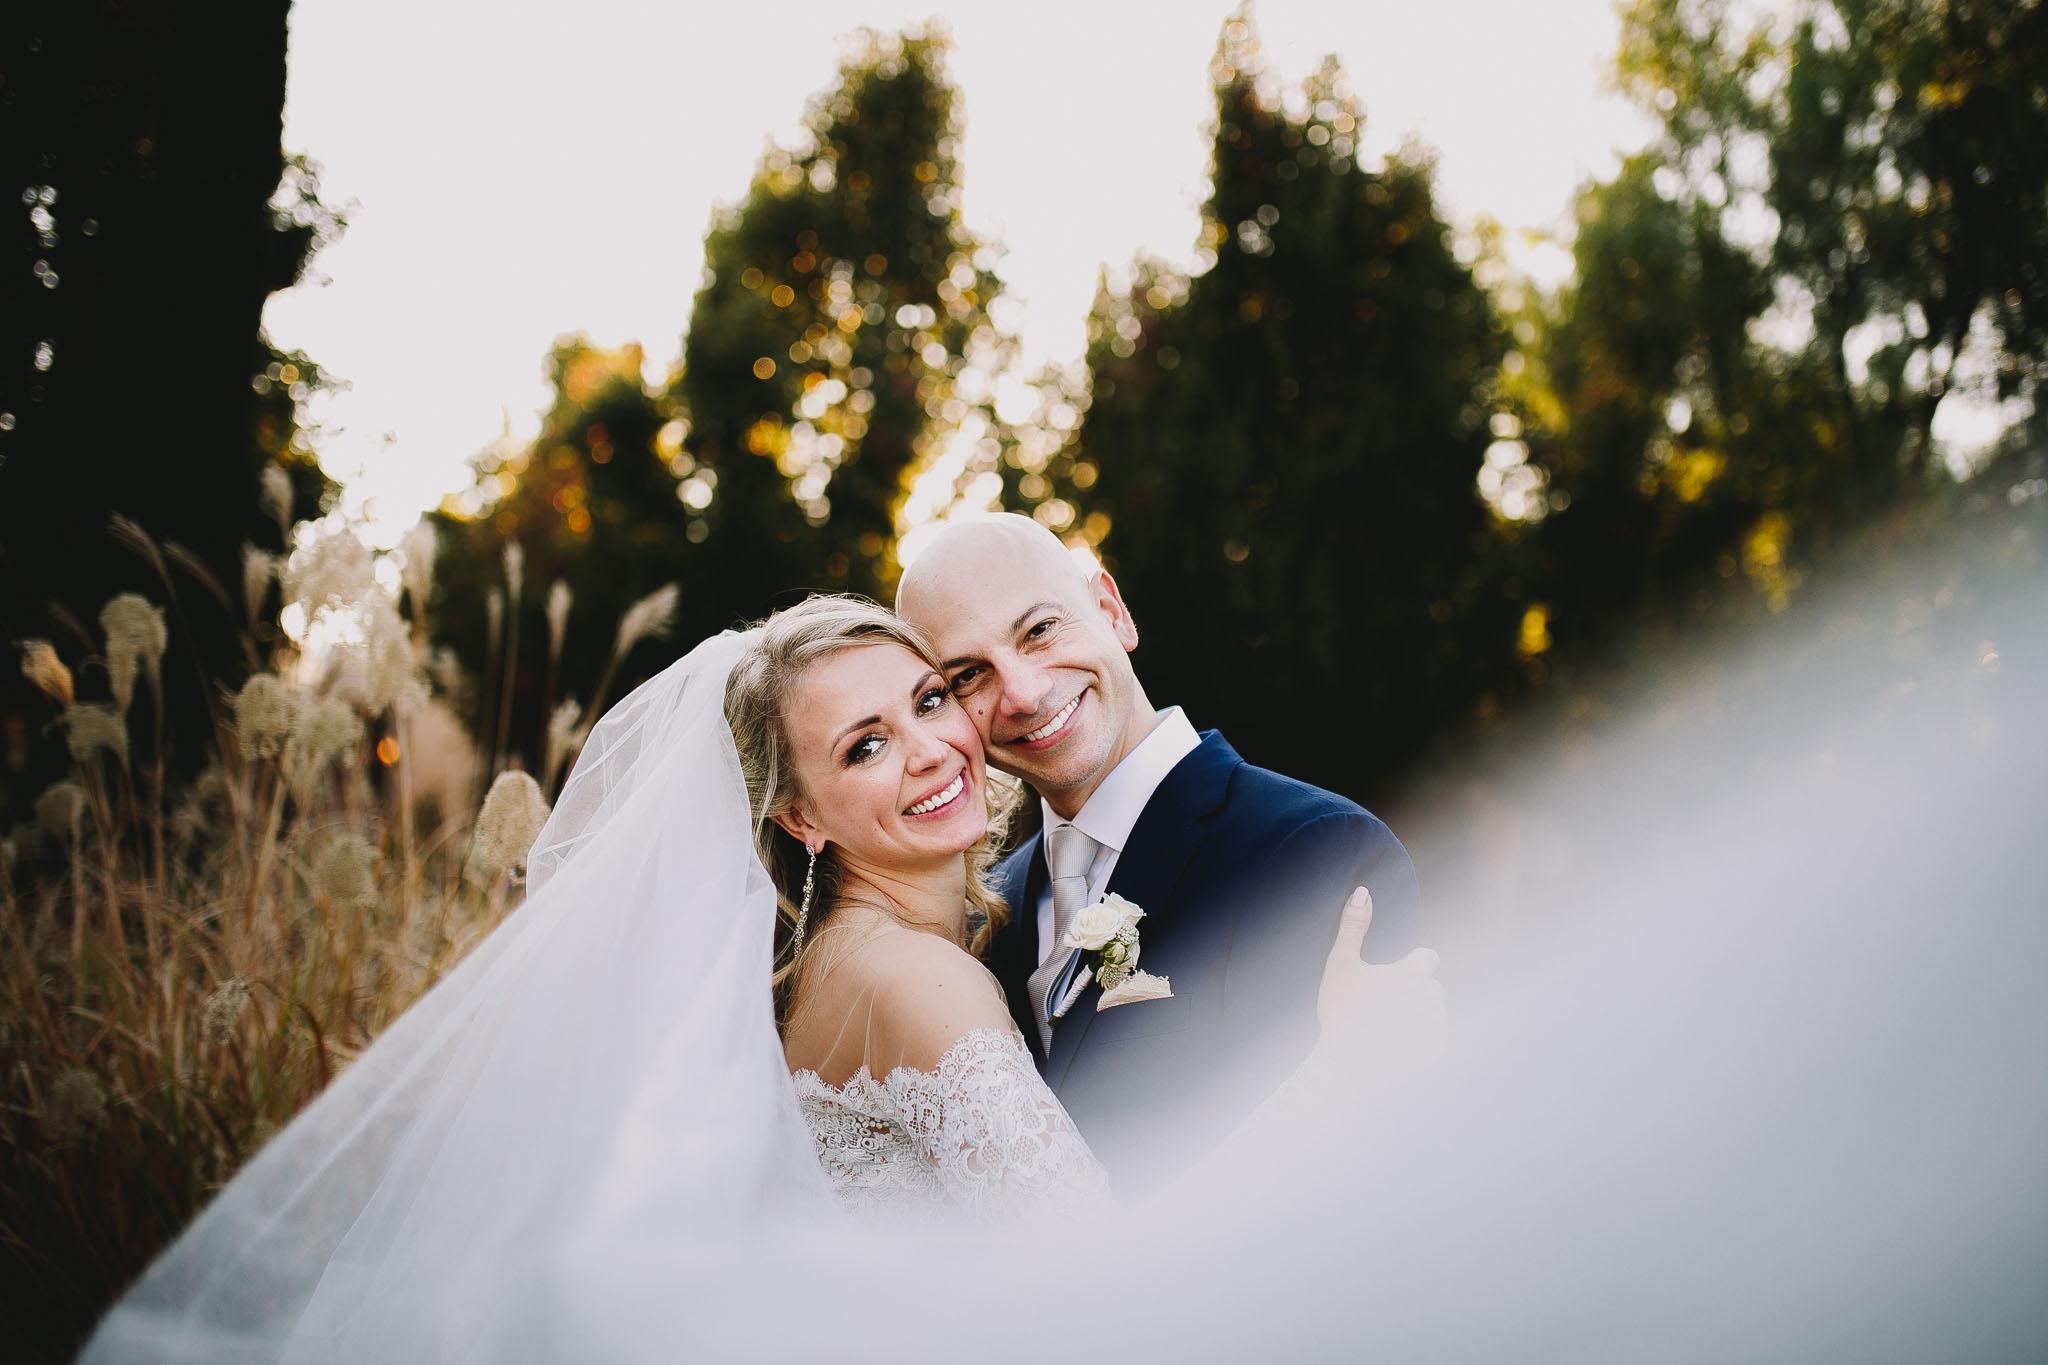 Archer Inspired Wedding Photography Menlo Park California High End Photographer-8.jpg